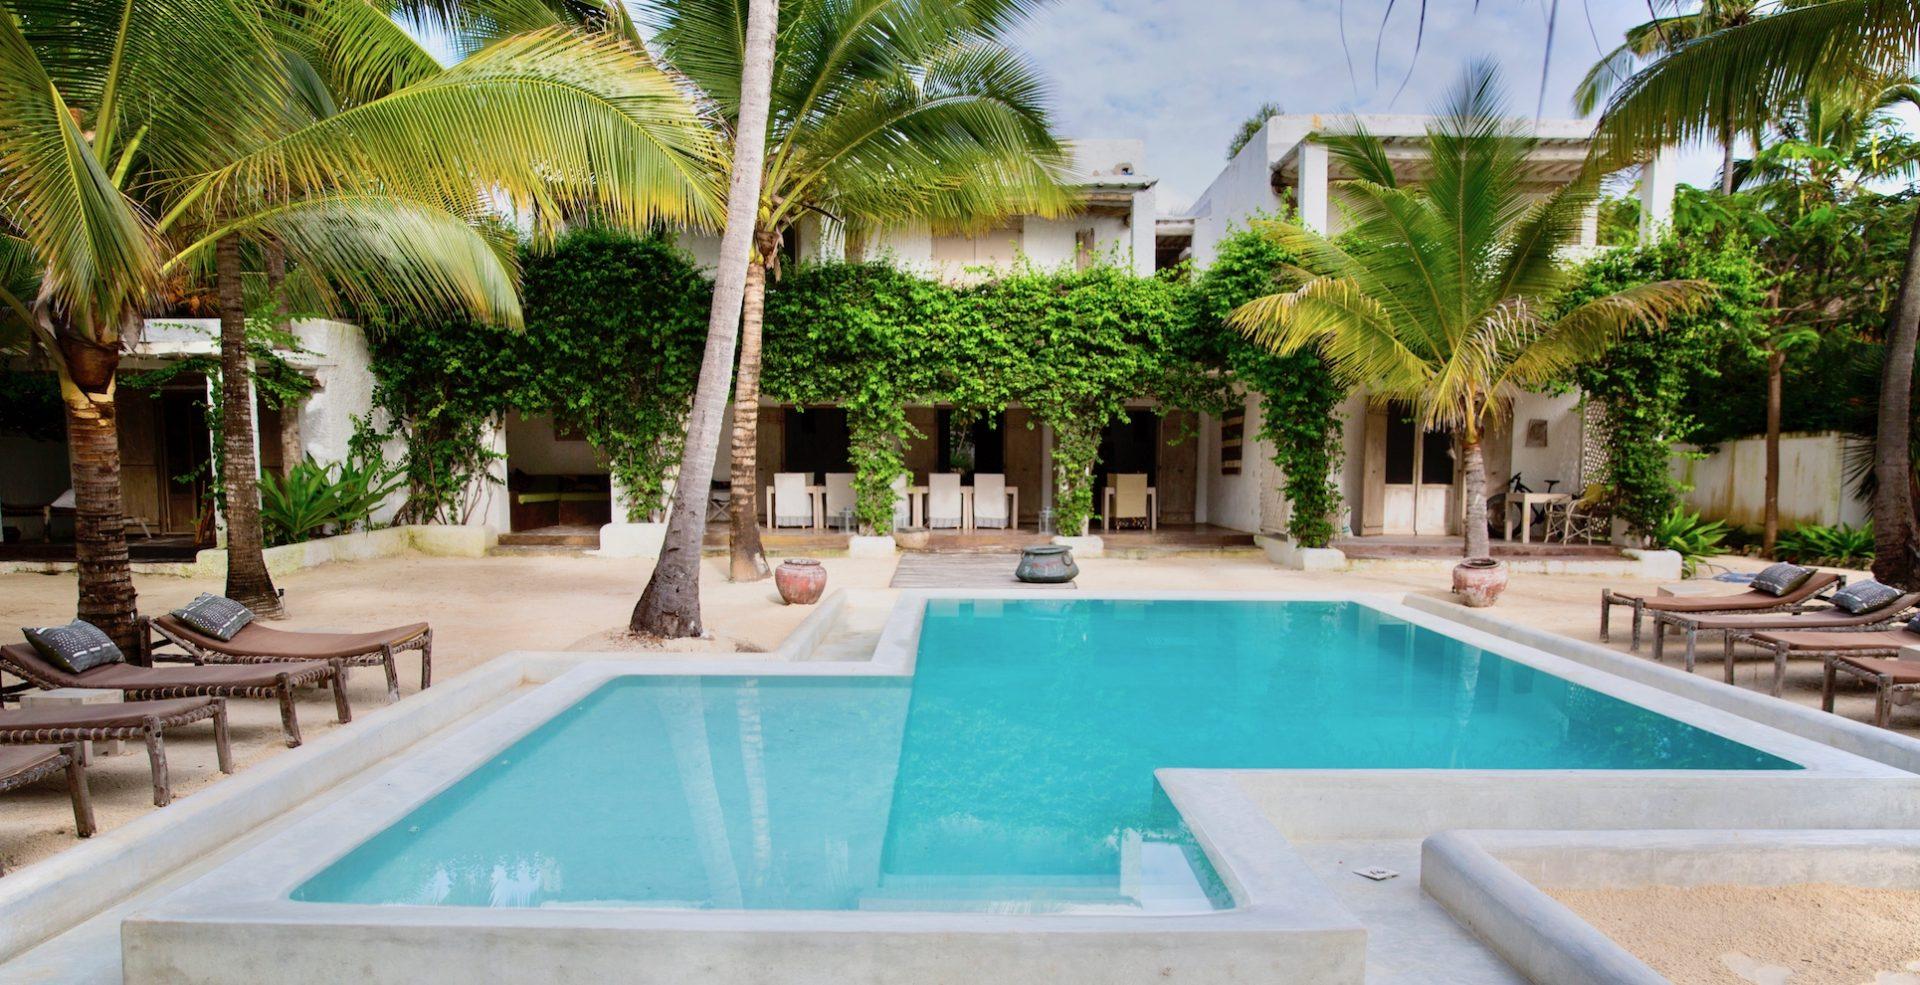 Uzuri Villa pool and veranda view